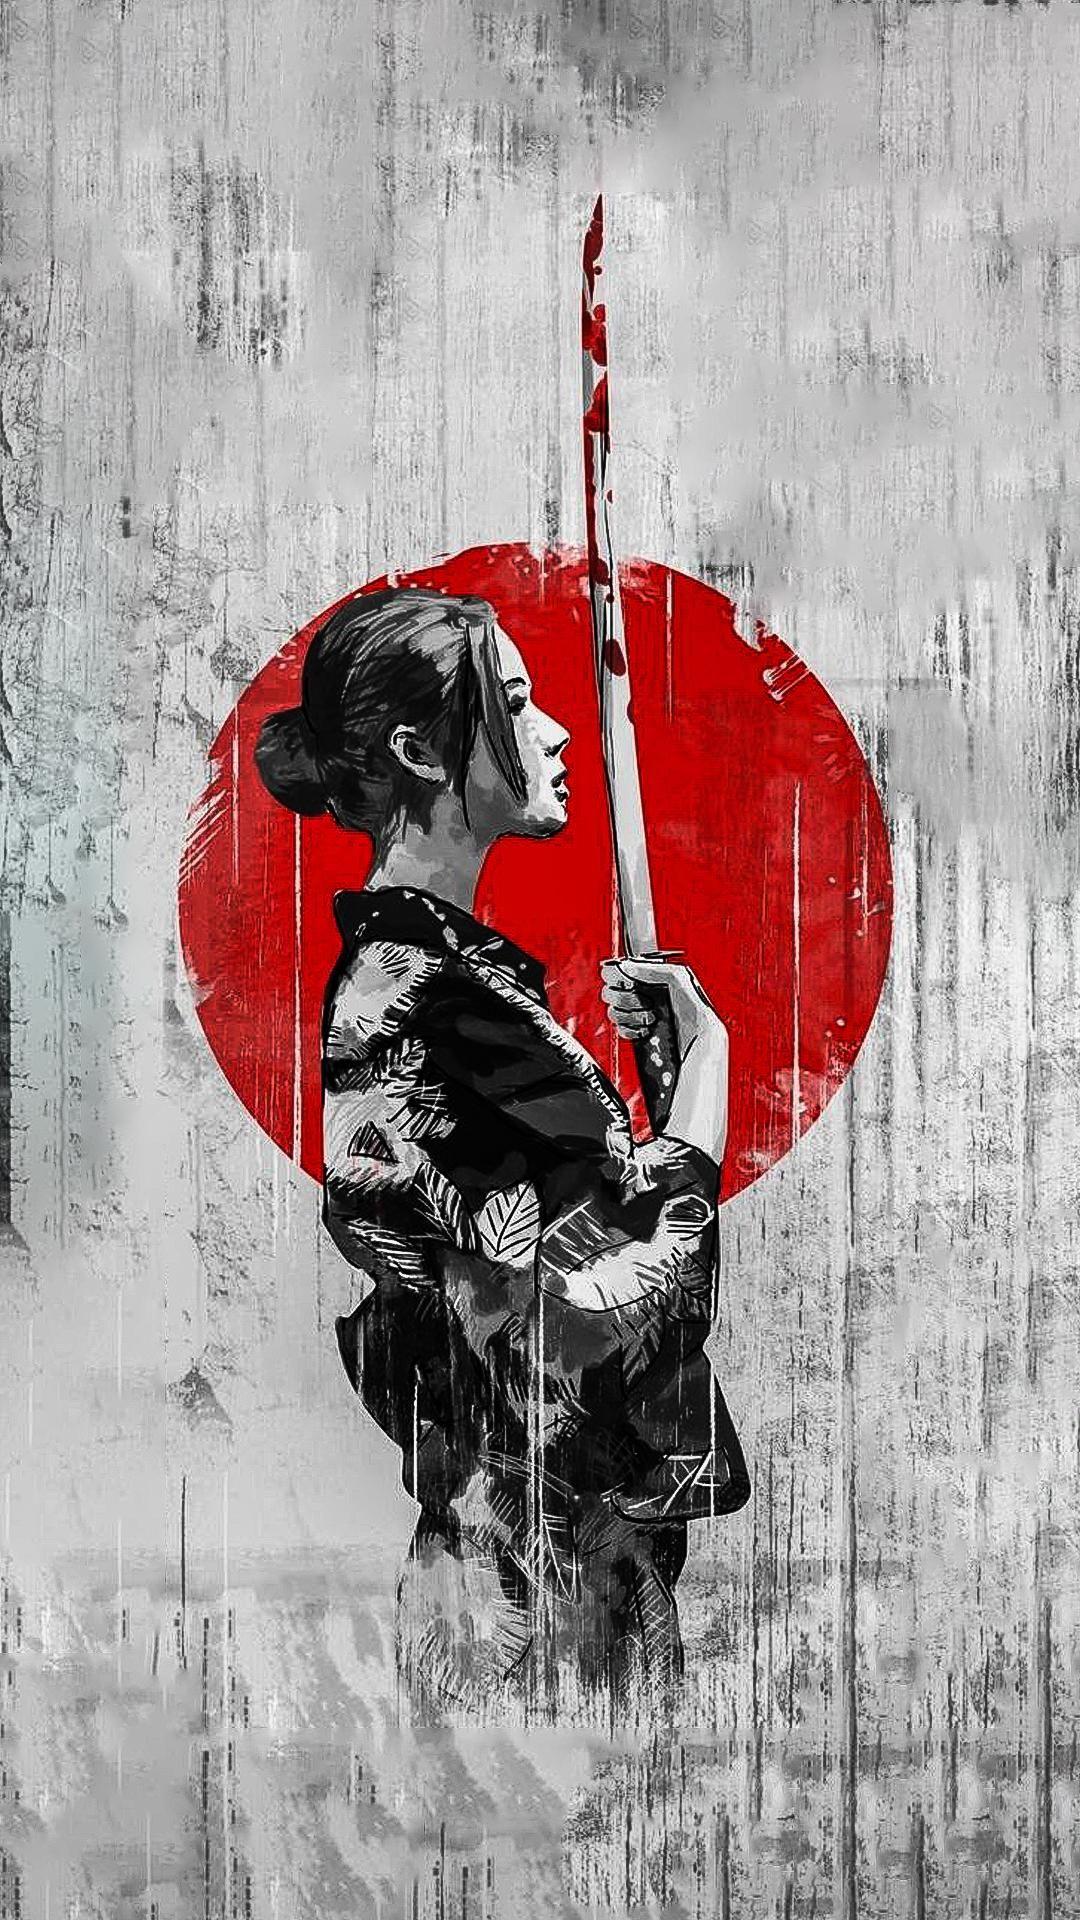 Japanese Samurai Wallpaper Posted By Sarah Johnson